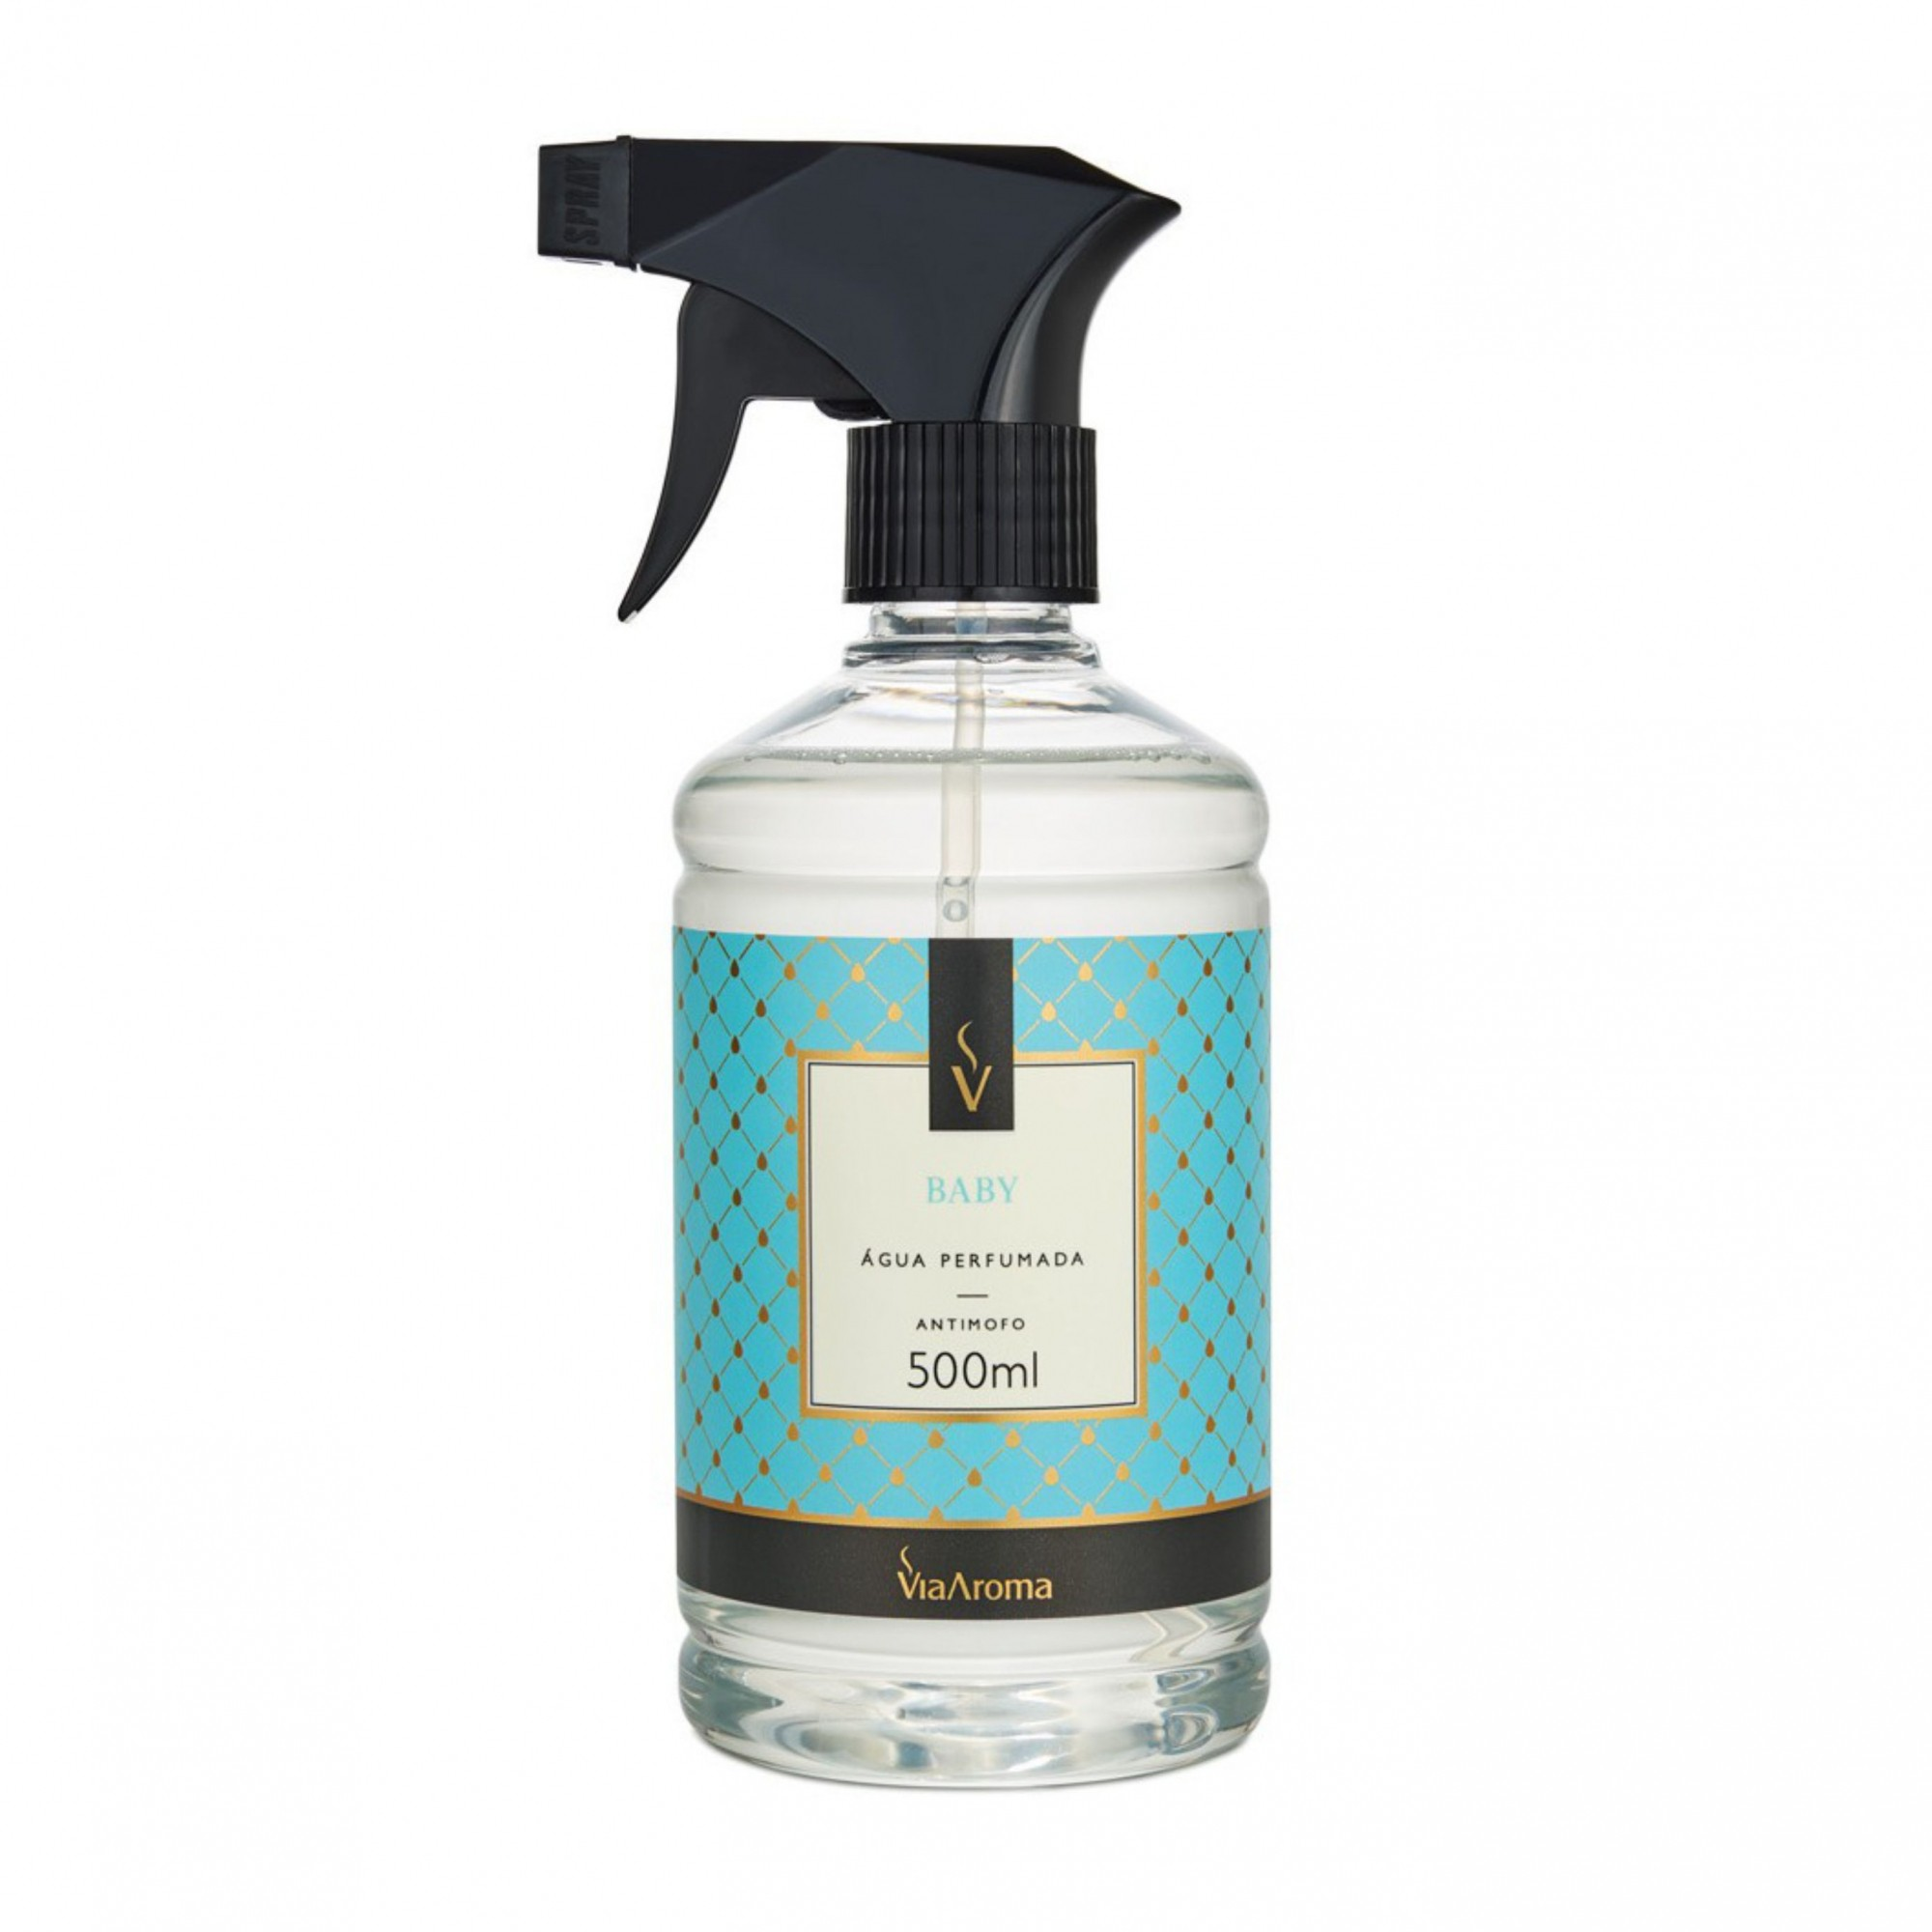 Água Perfumada para Tecidos Baby ViaAroma 500ml